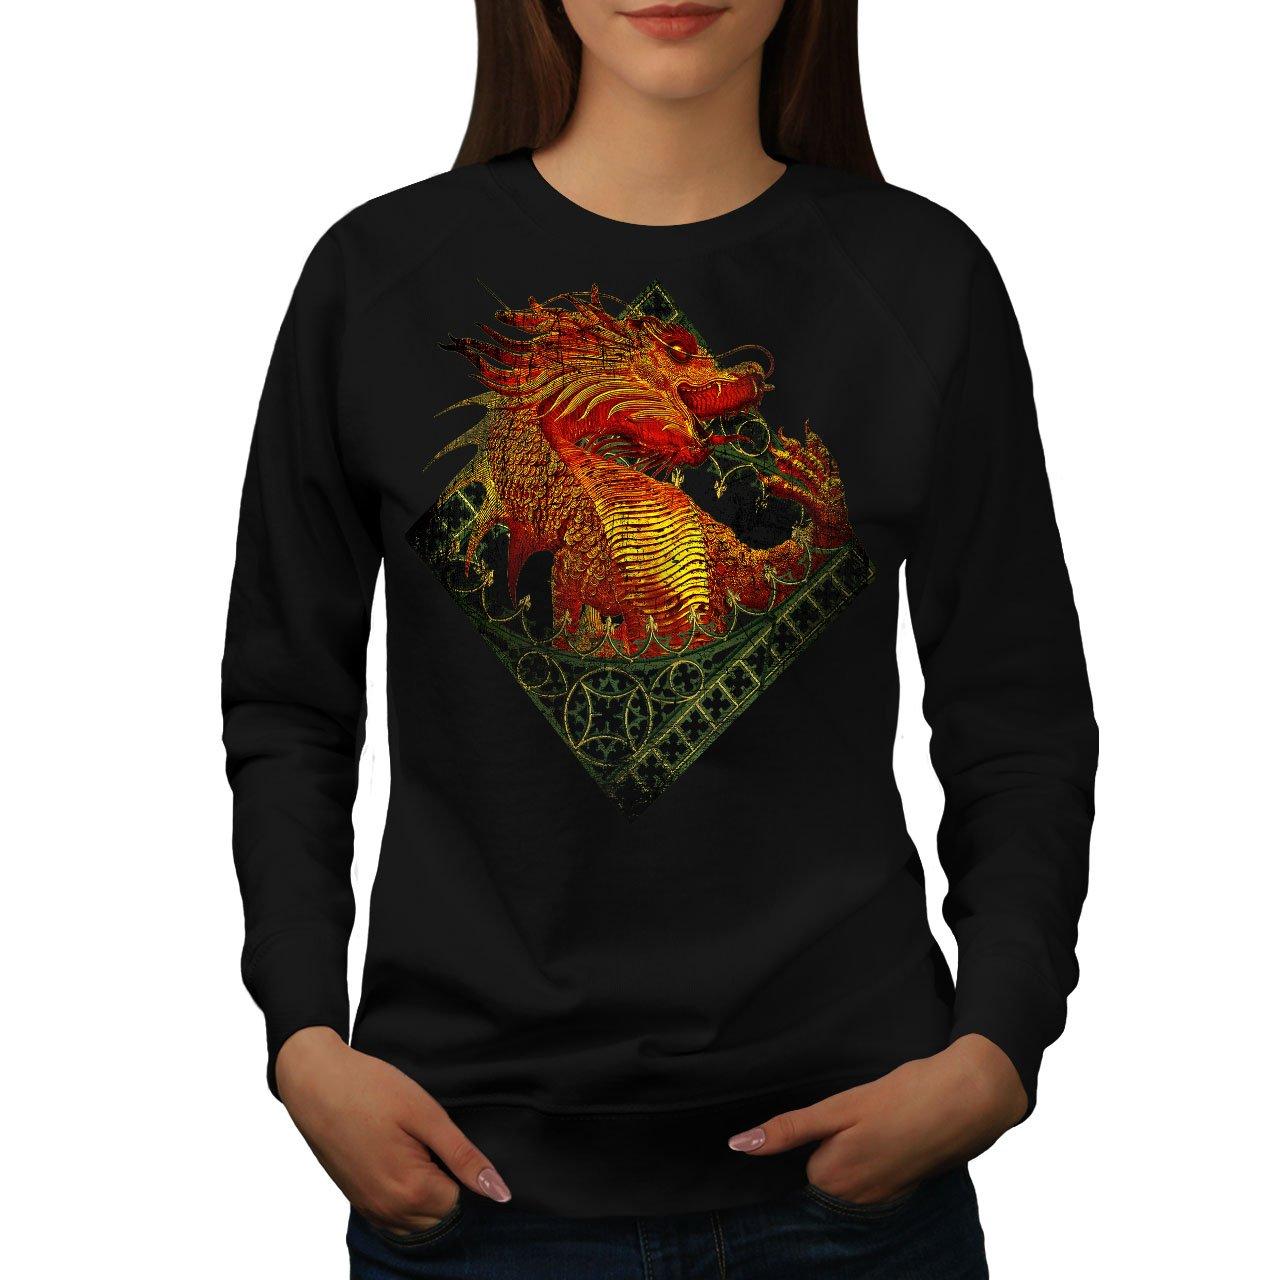 Wellcoda Asian Dragon Womens Sweatshirt, Mythical Print Pullover Jumper